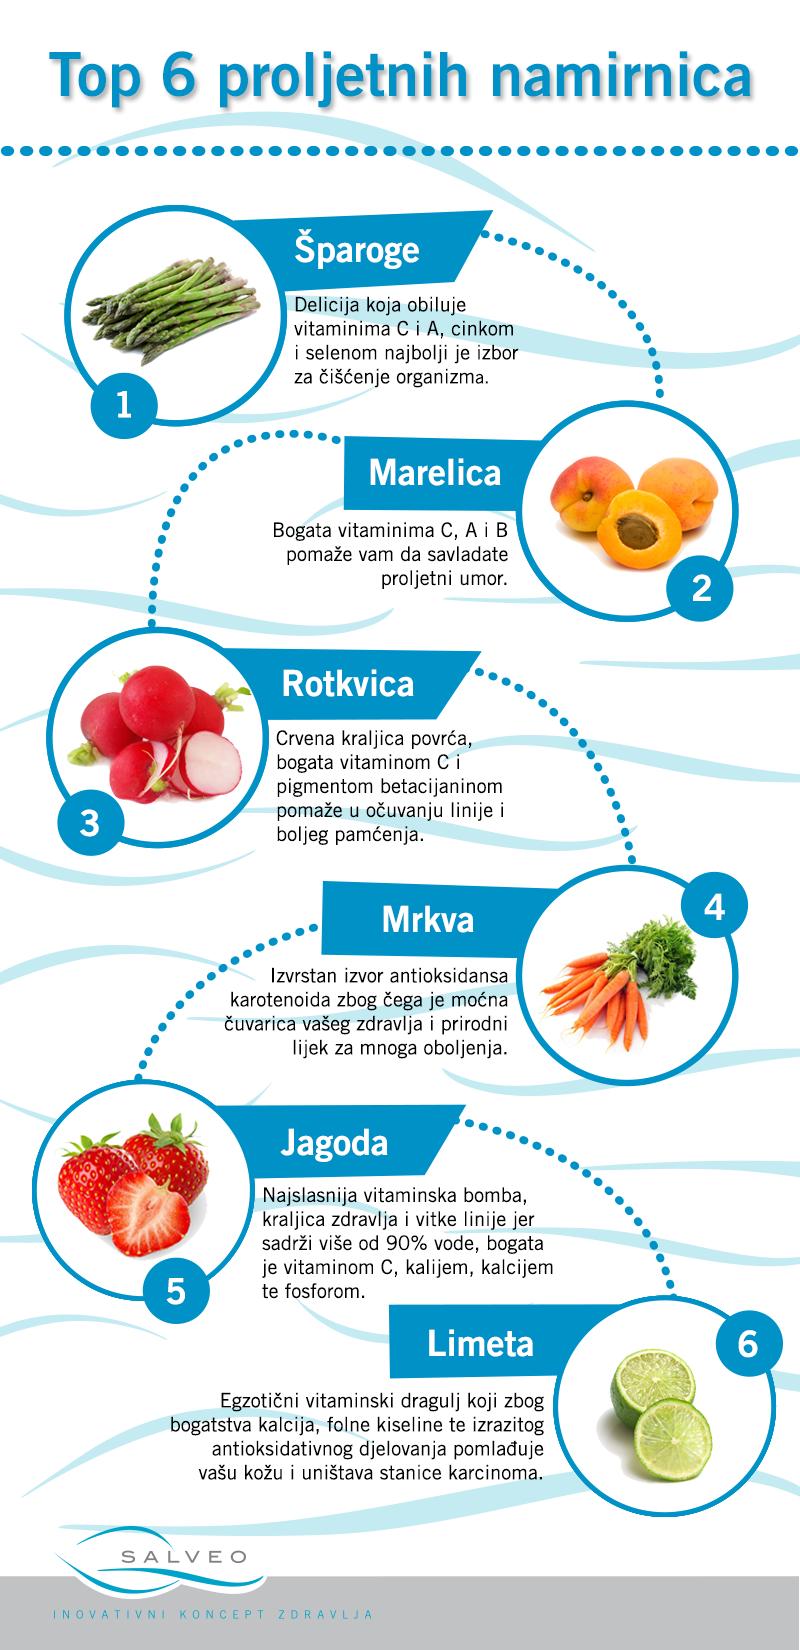 Top 6 proljetnih namirnica